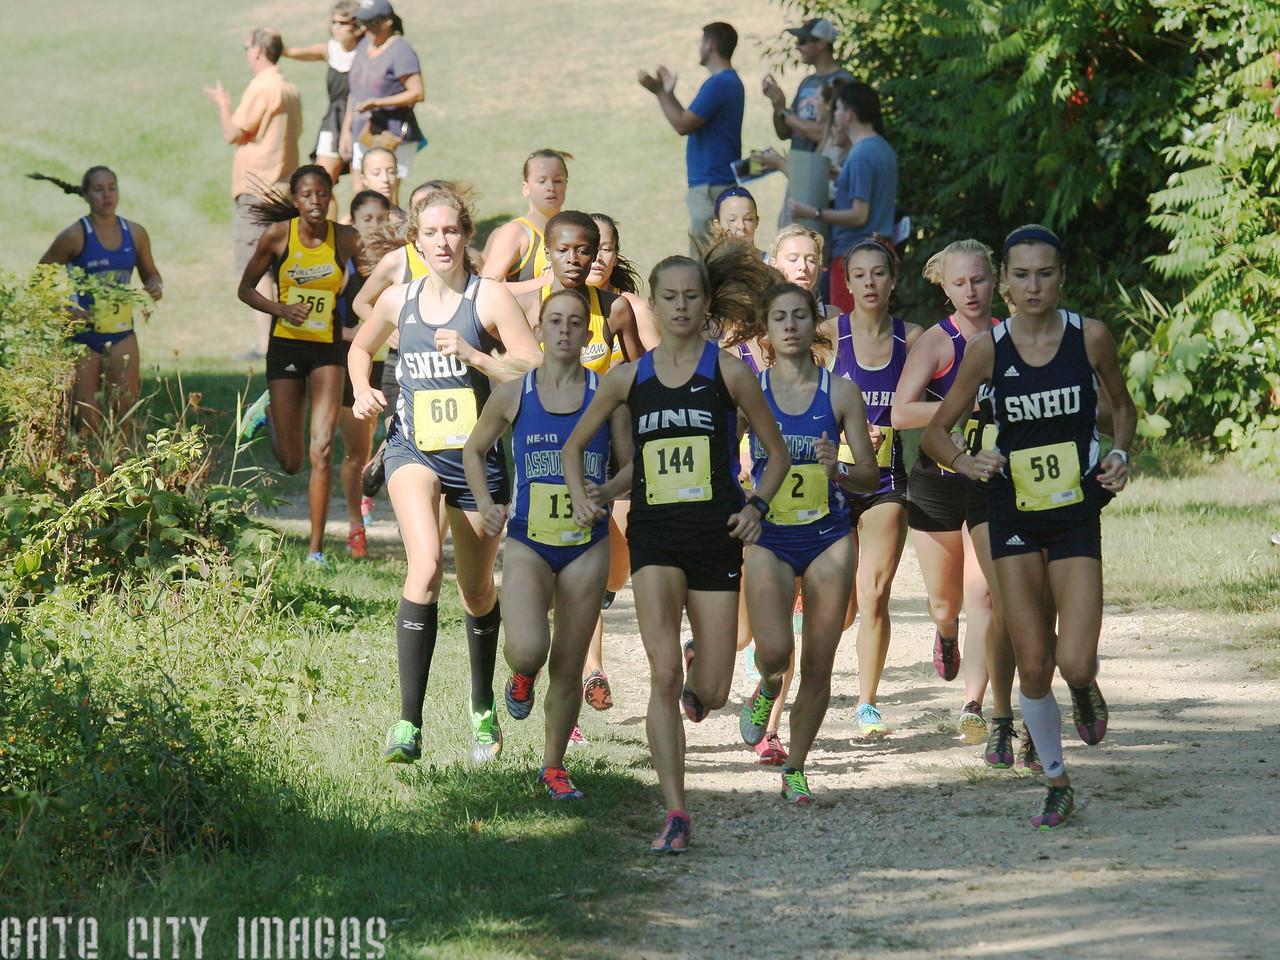 IMG_1613 XC Race UNE Girls dpptrm